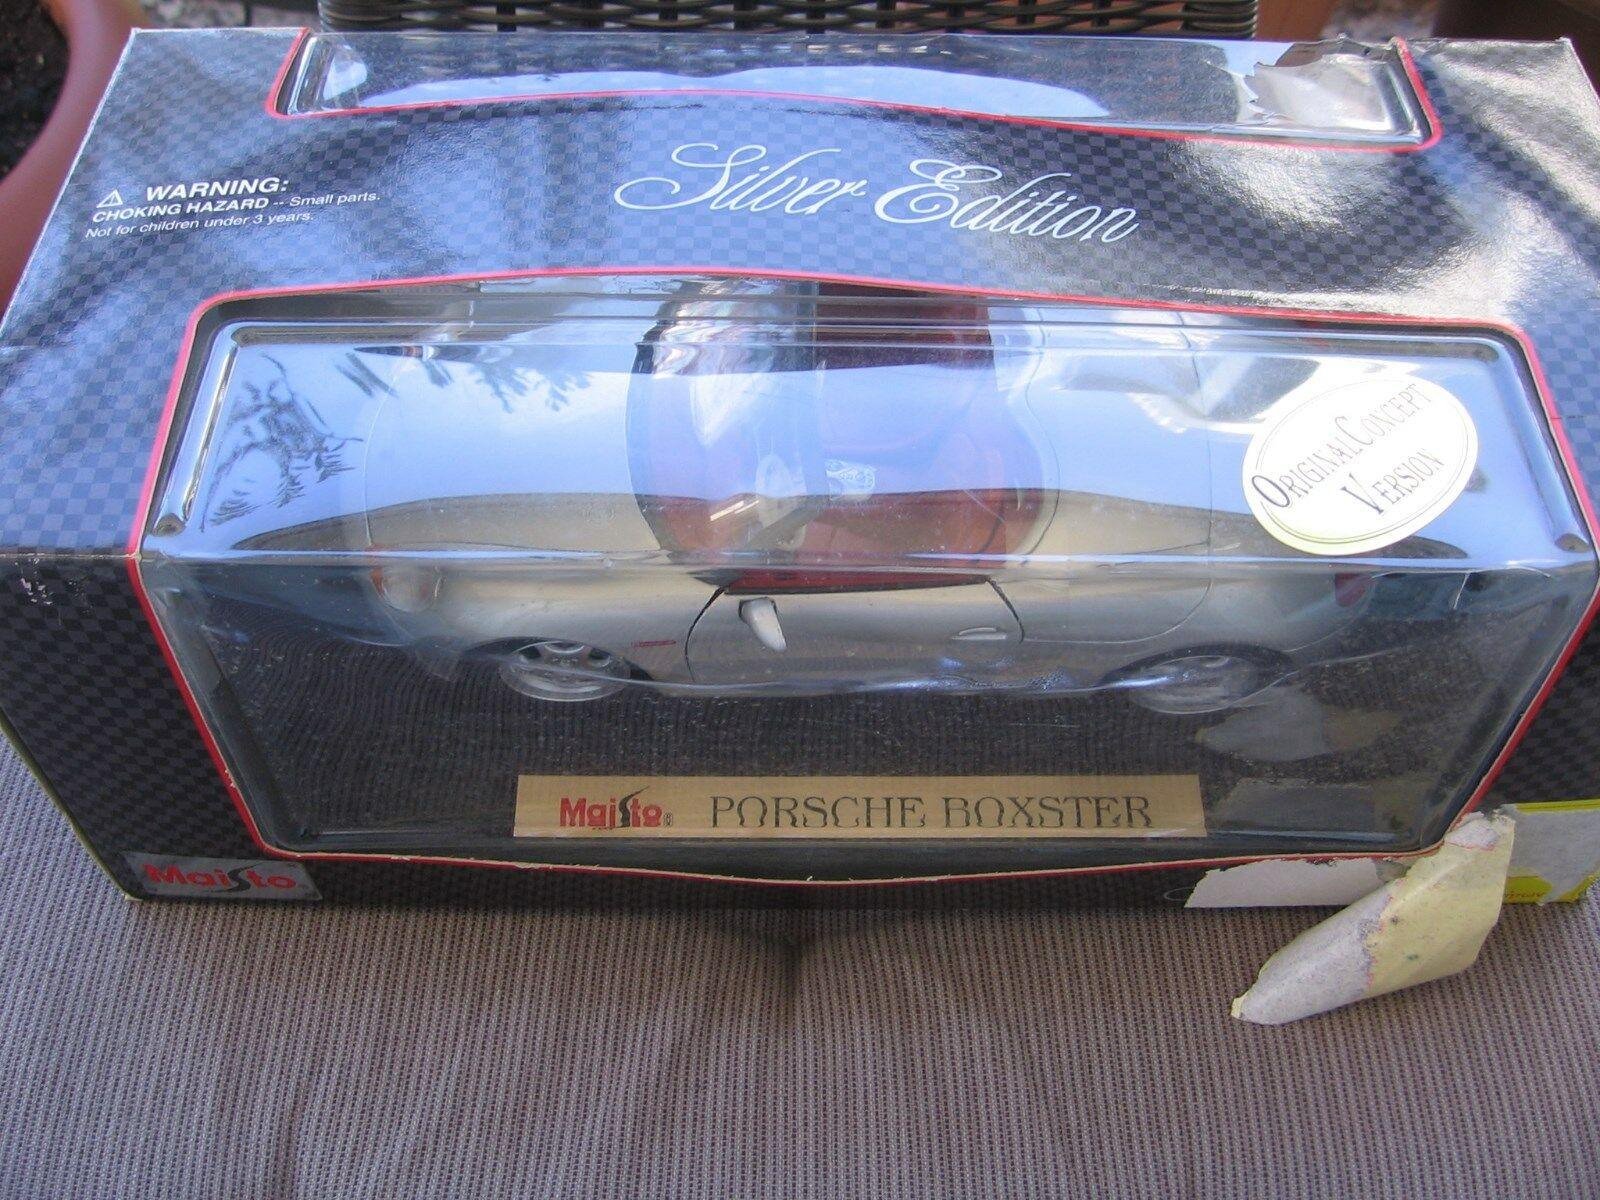 la mejor oferta de tienda online Porsche Boxster plata 1 18 maisto OVP & & & New   de moda